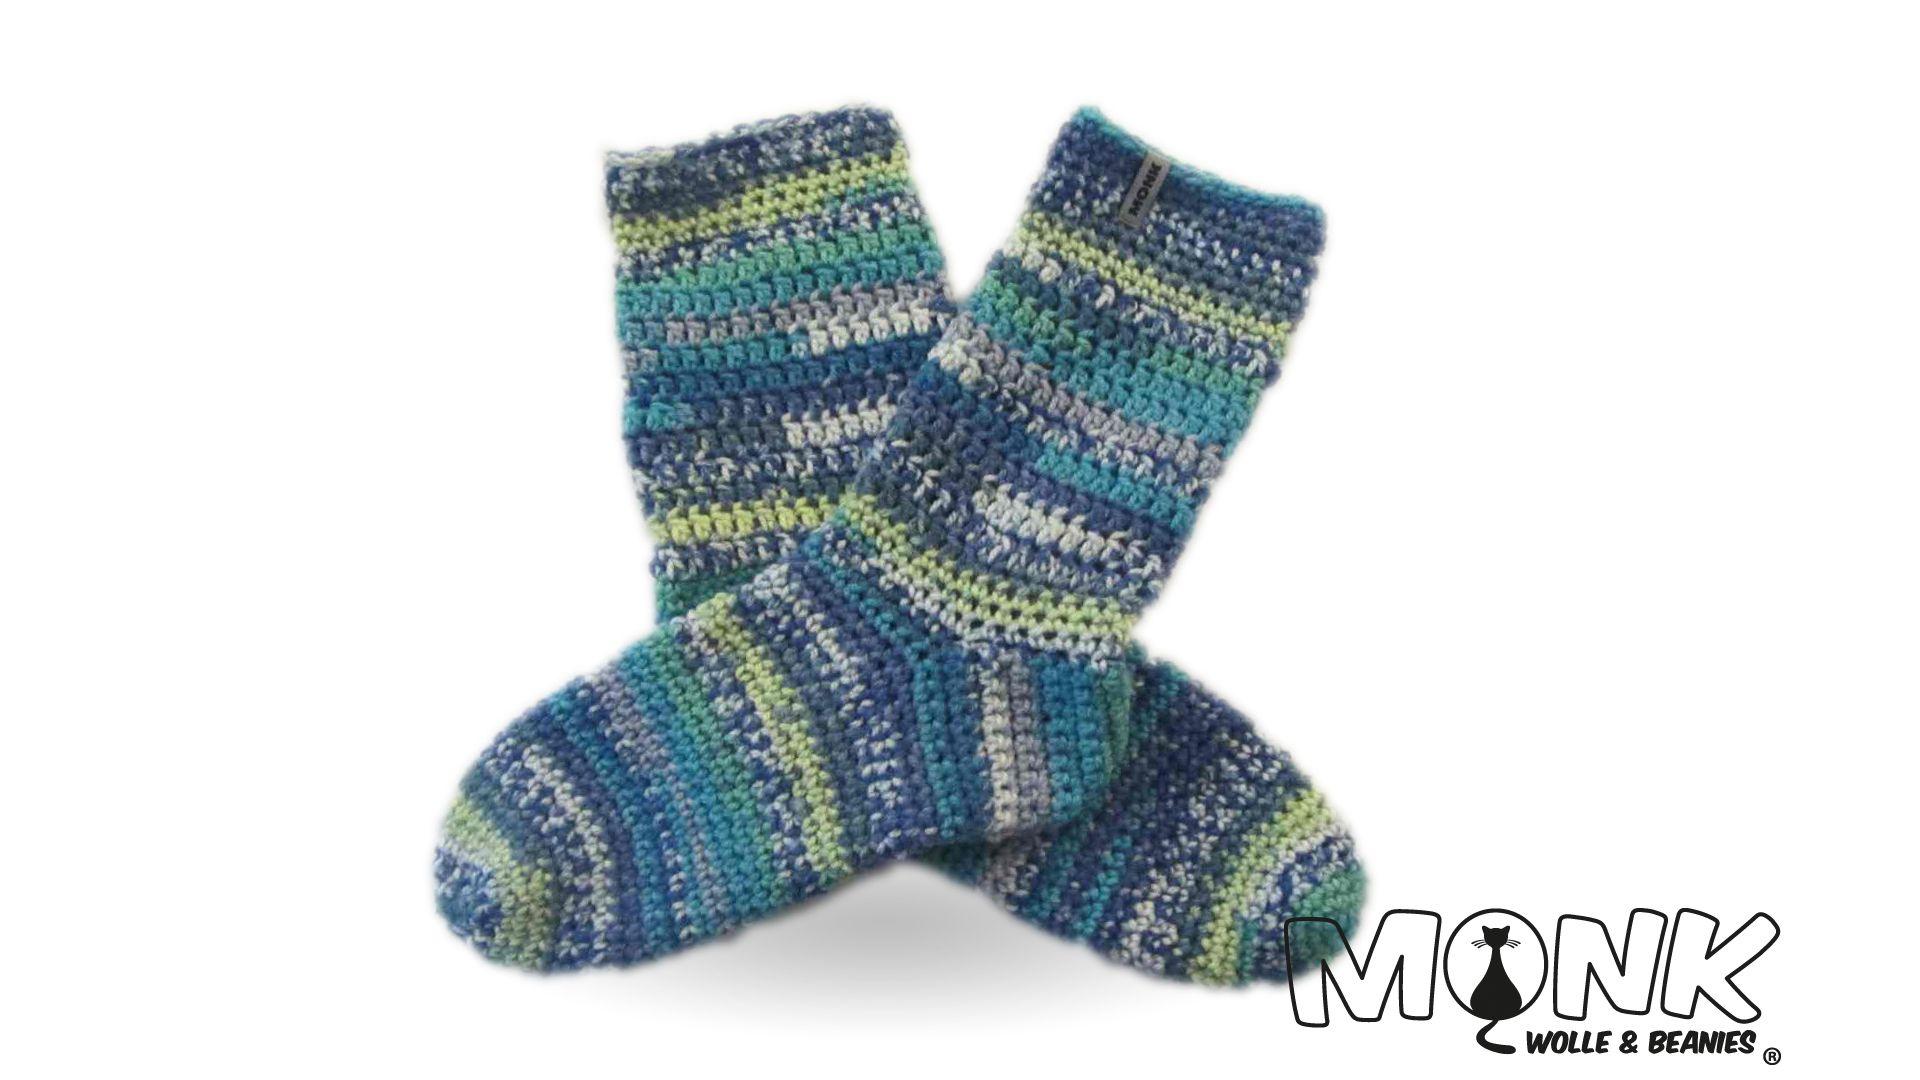 Socken Hüttenschuhe Häkeln Monk Wolle Beanies Häkelanleitung